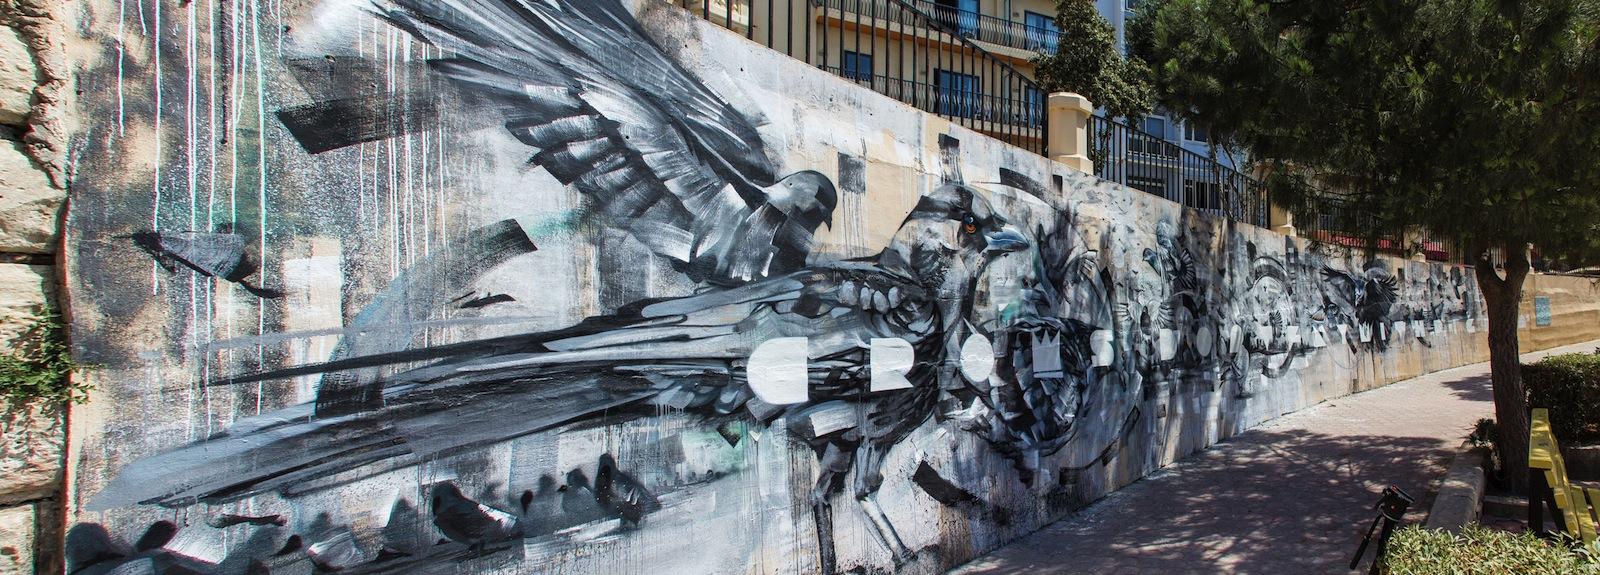 By-Steve-Locatelli-and-Smates-at-the-Sliema-Street-Art-Festival.-Photo-by-Asperholm-Productions-in-Sliema-Malta-1